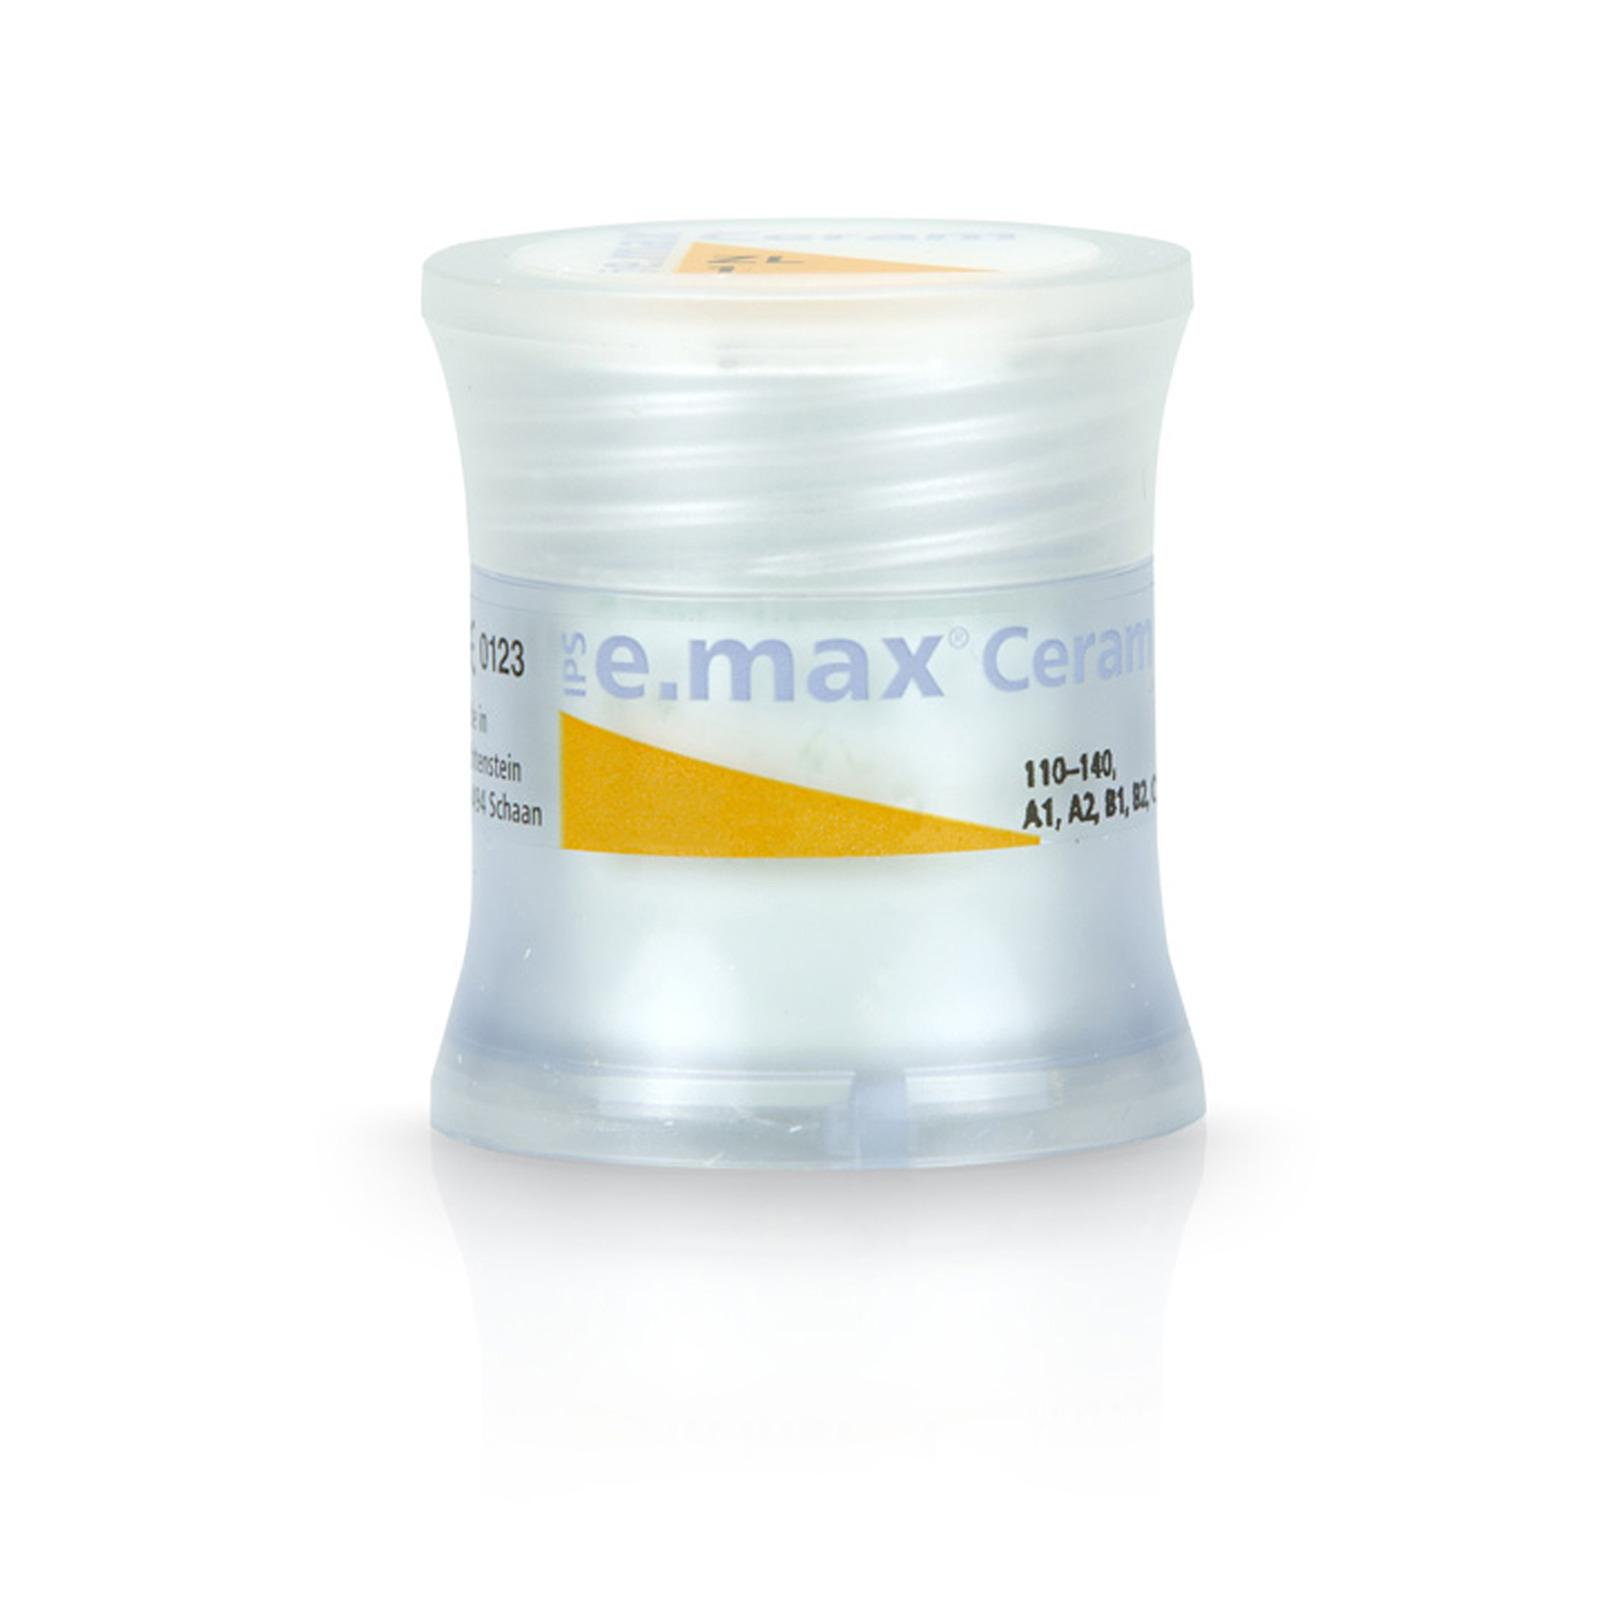 IPS e.max Ceram ZirLiner 5 g 1